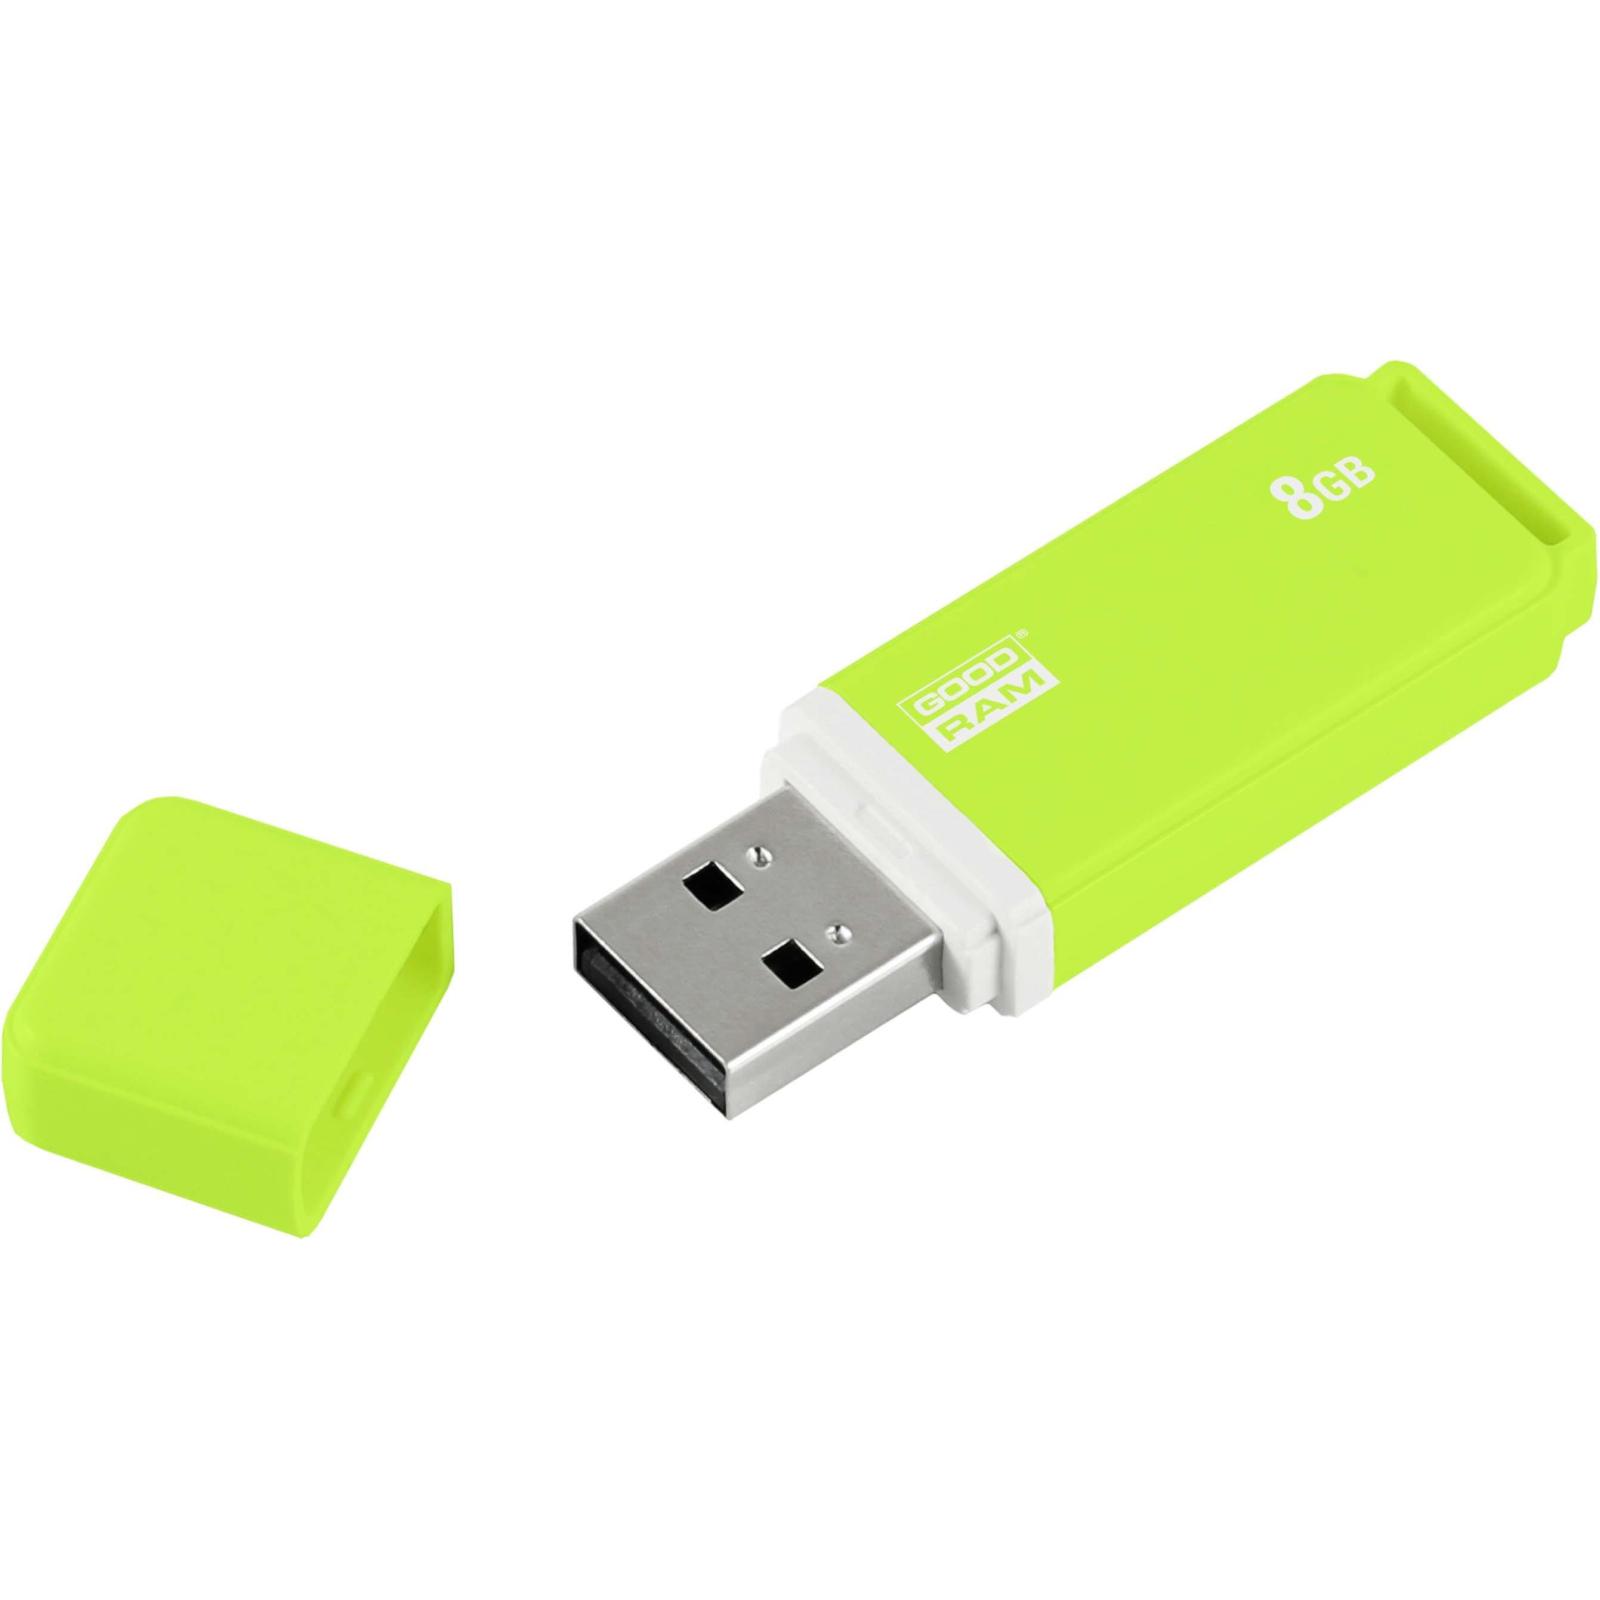 USB флеш накопитель Goodram 8GB UMO2 Green USB 2.0 (UMO2-0080G0R11) изображение 3